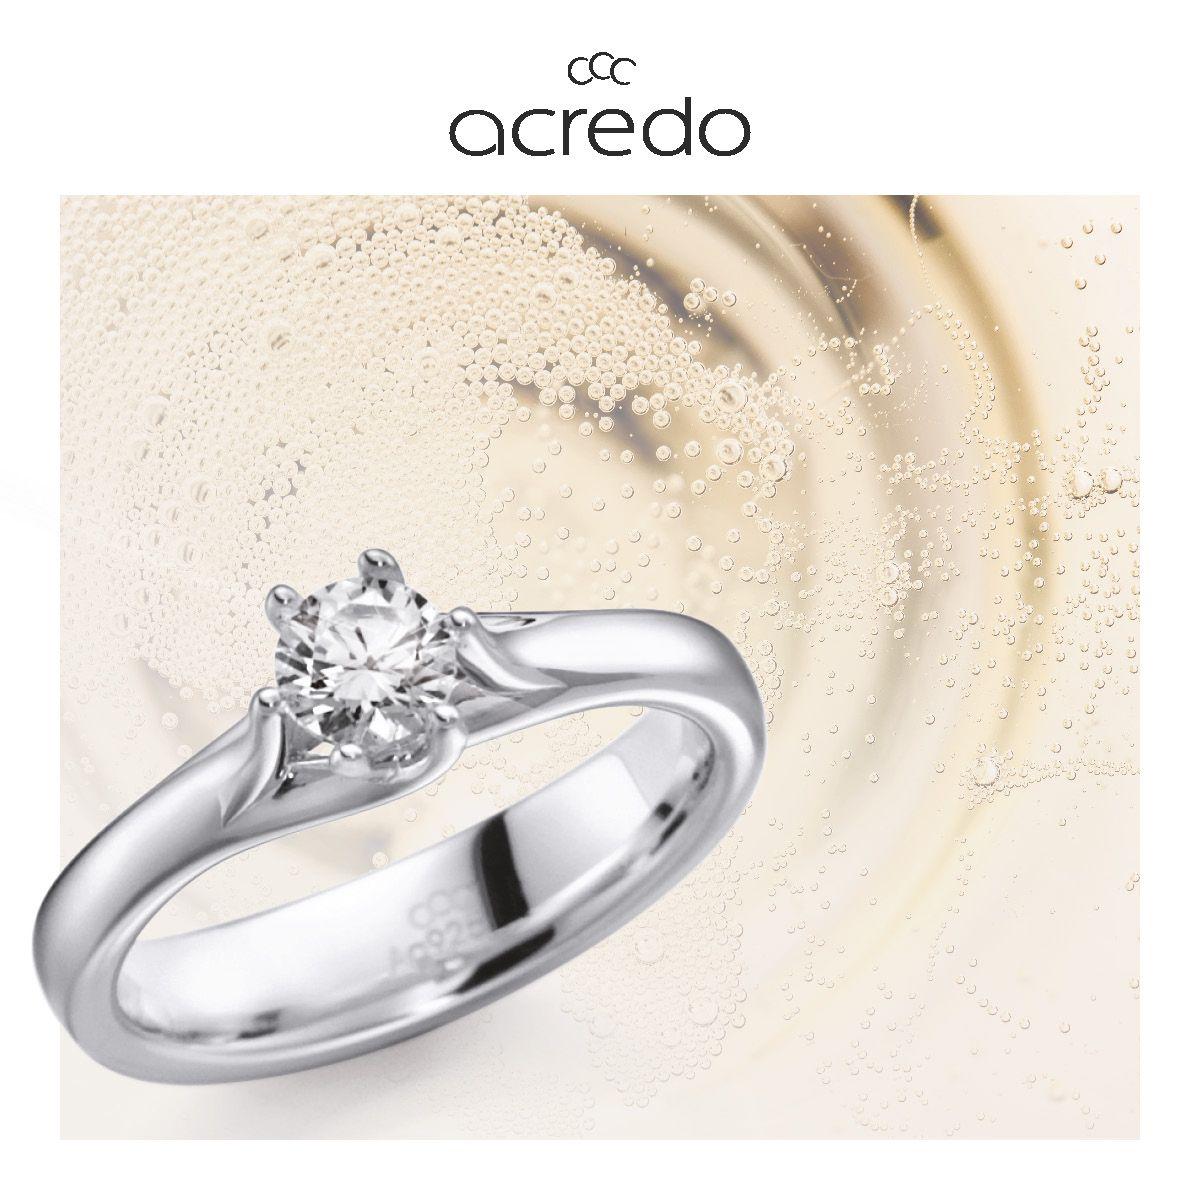 Verlobungsring Zirkonia Skillful Manufacture 925 Sterlingsilber Damen-ring